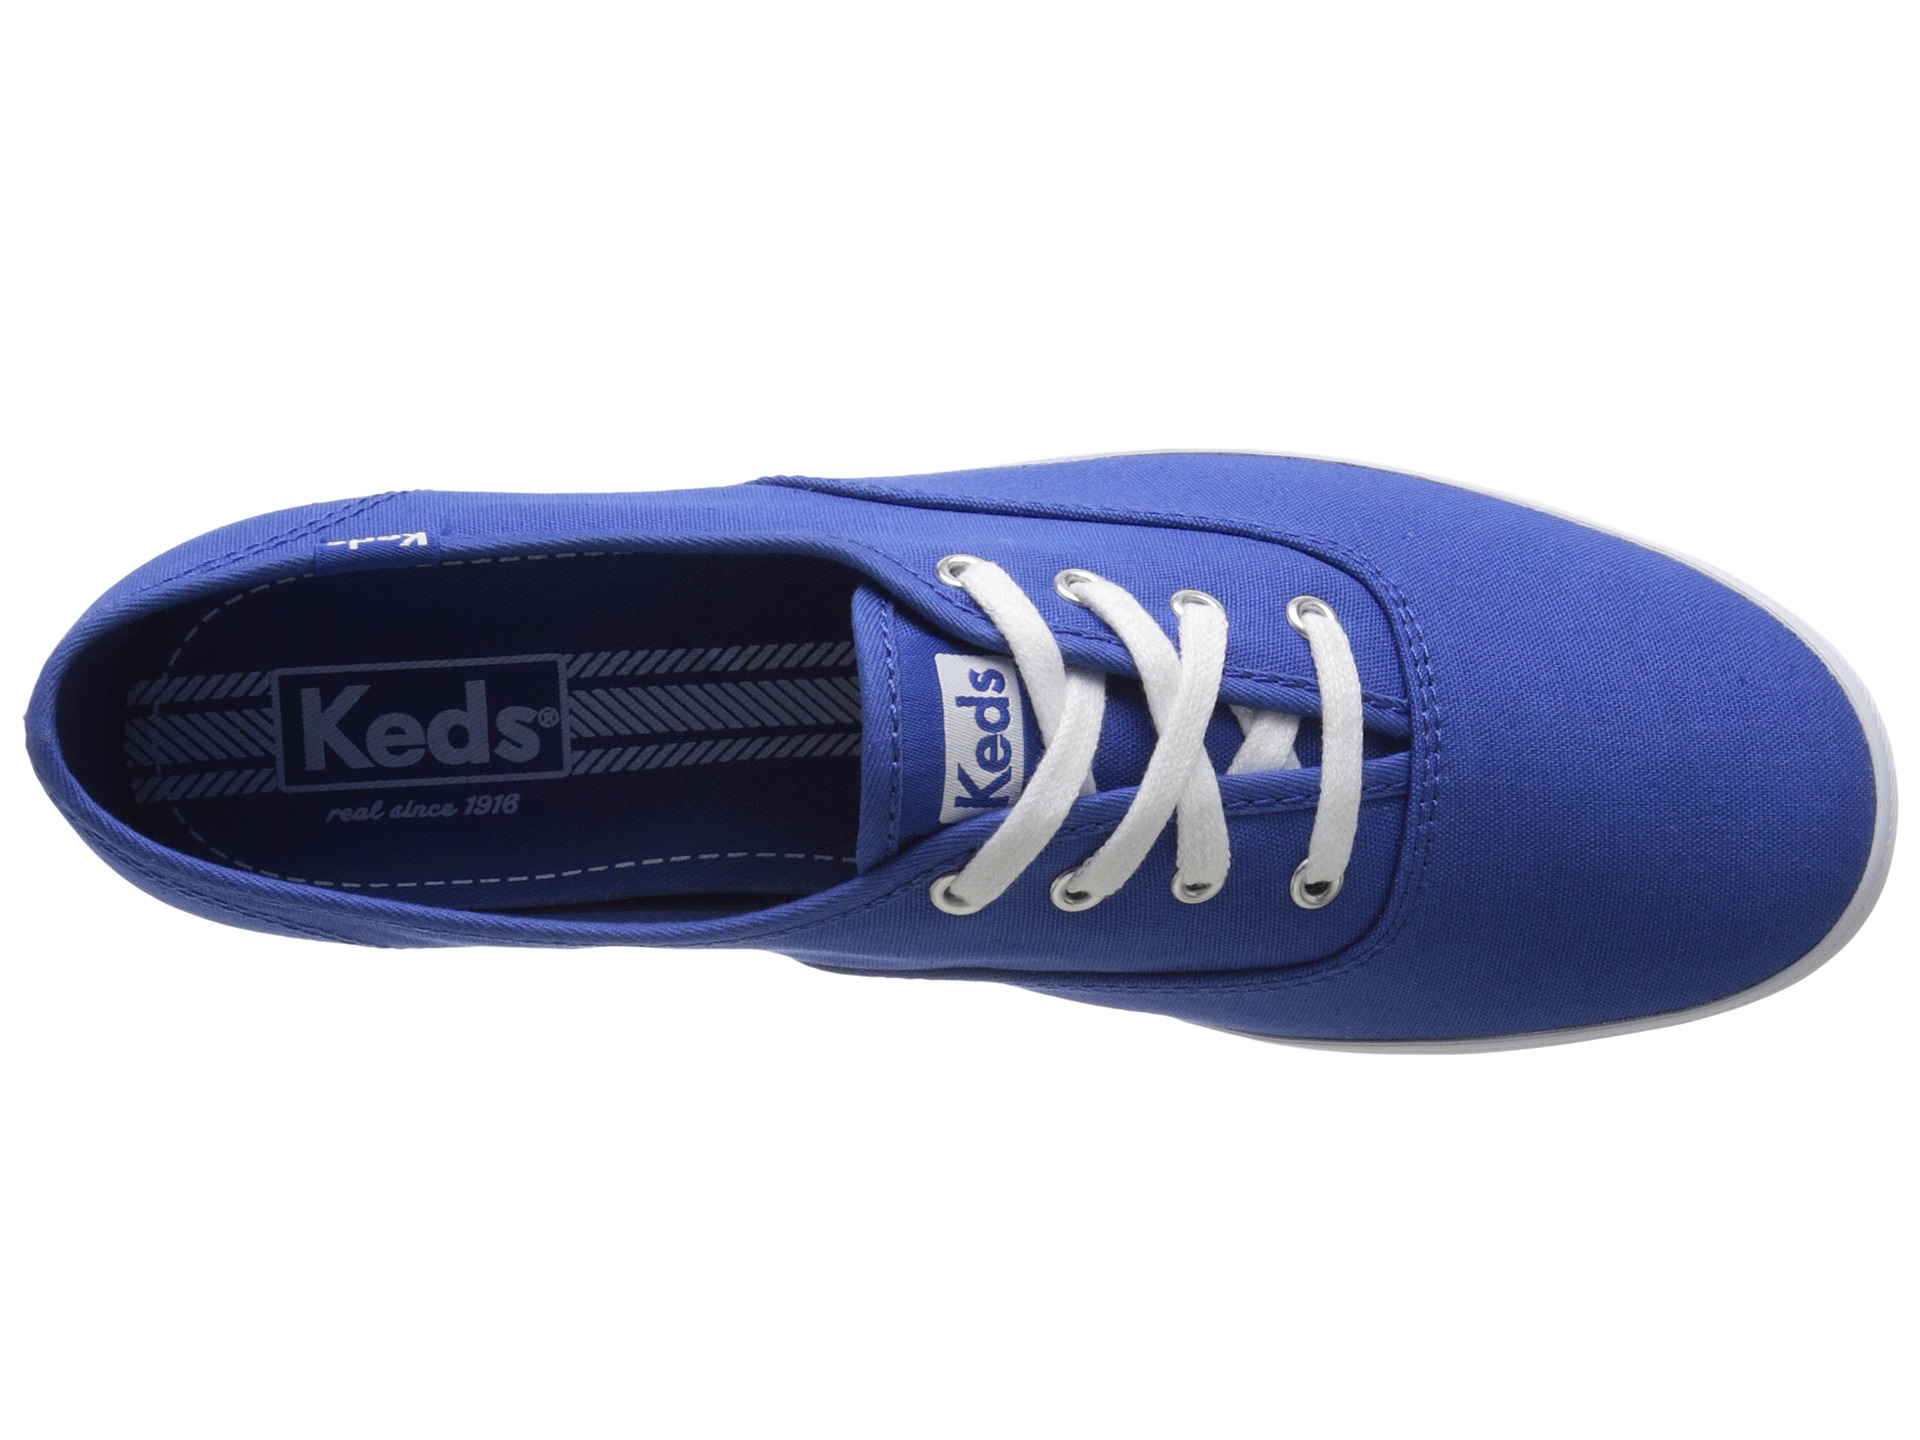 keds champion seasonal solids blue 2